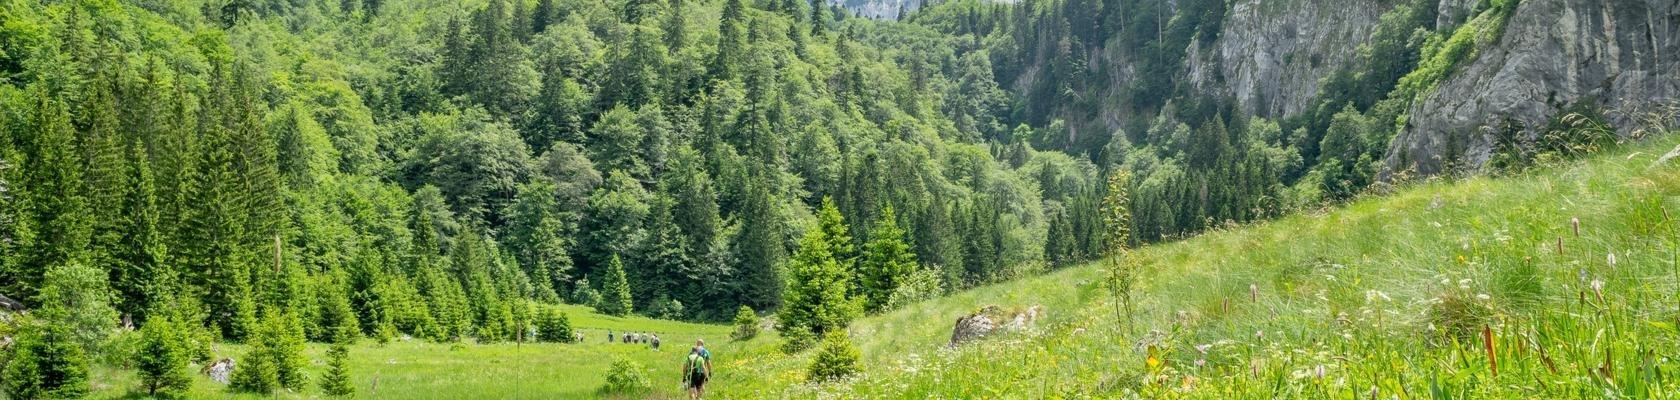 Sutjeska Nationaal Park (Bosnië-Herzegovina)